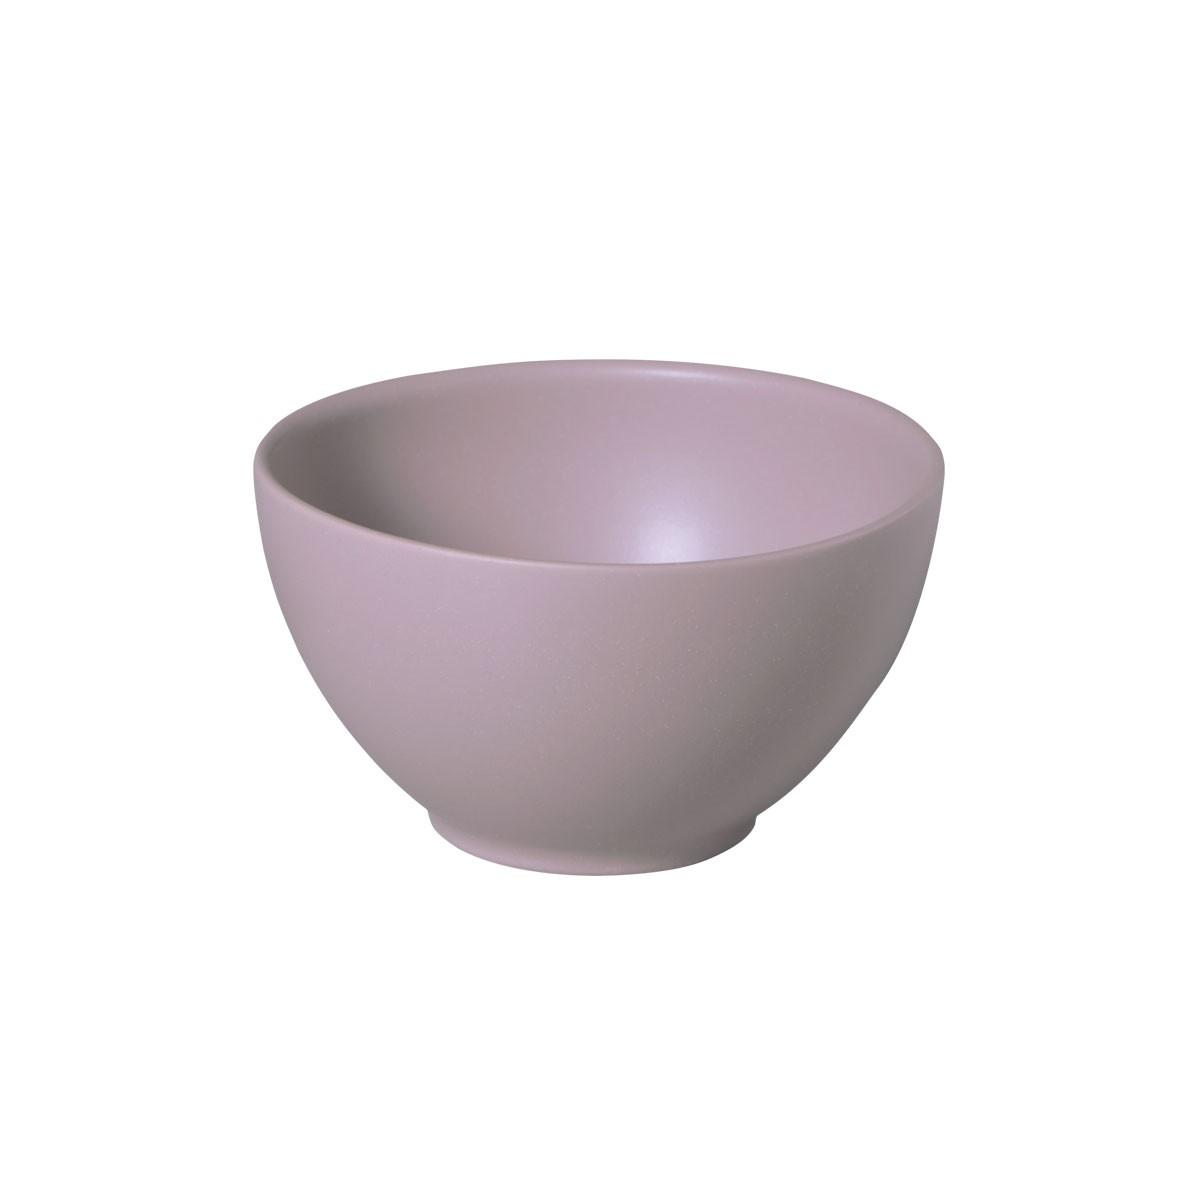 Tigela de Ceramica Mahogany 540ml Nude - Porto Brasil